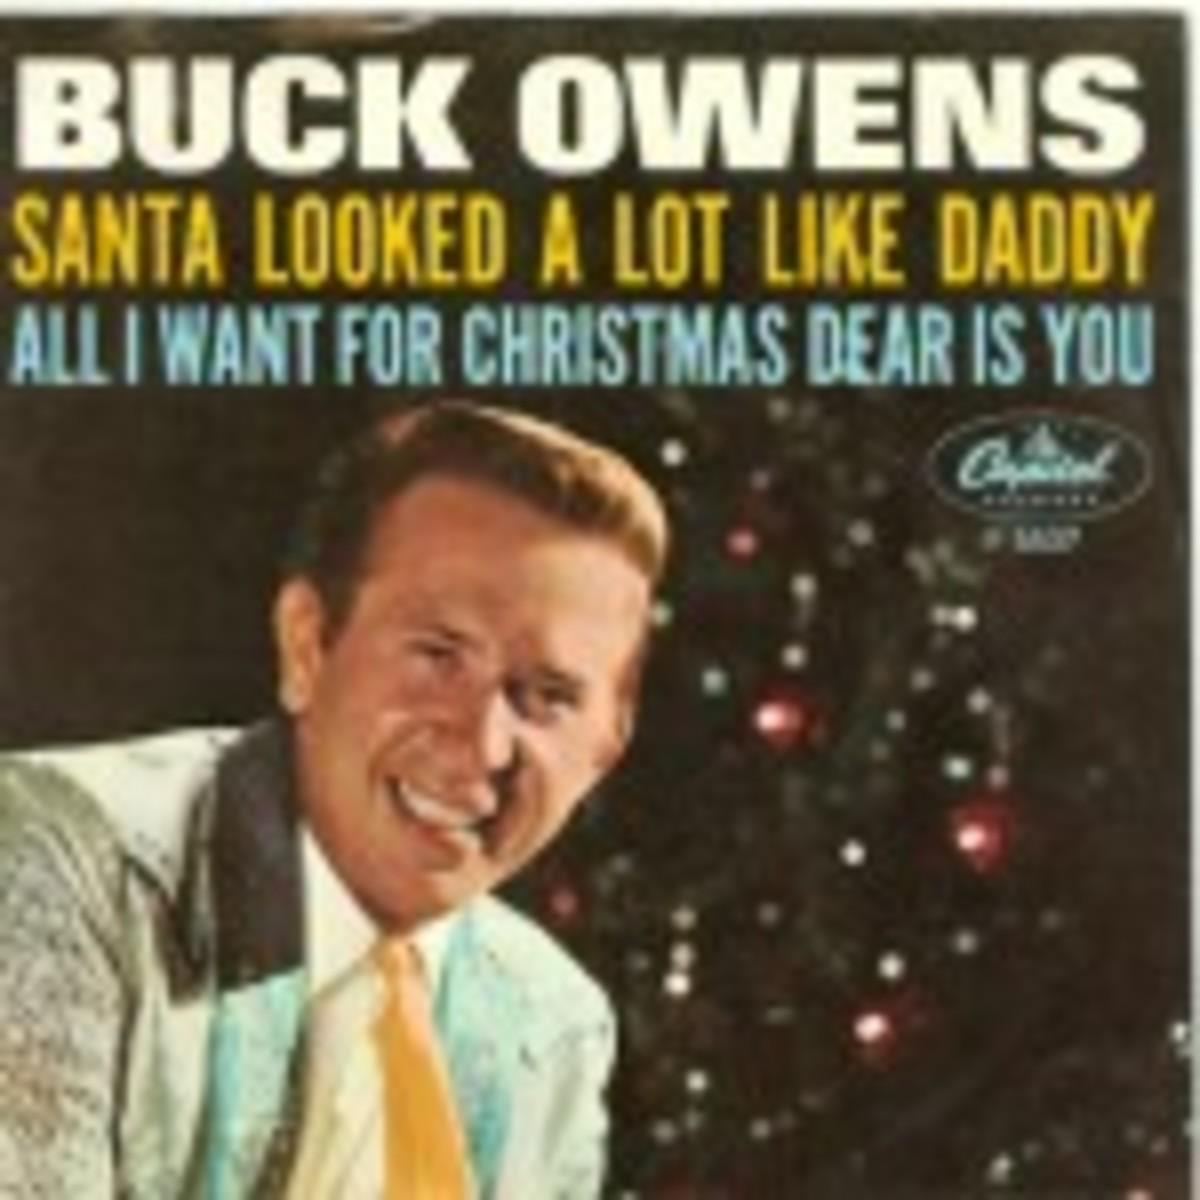 Buck Owens Santa Looked A Lot Like Daddy